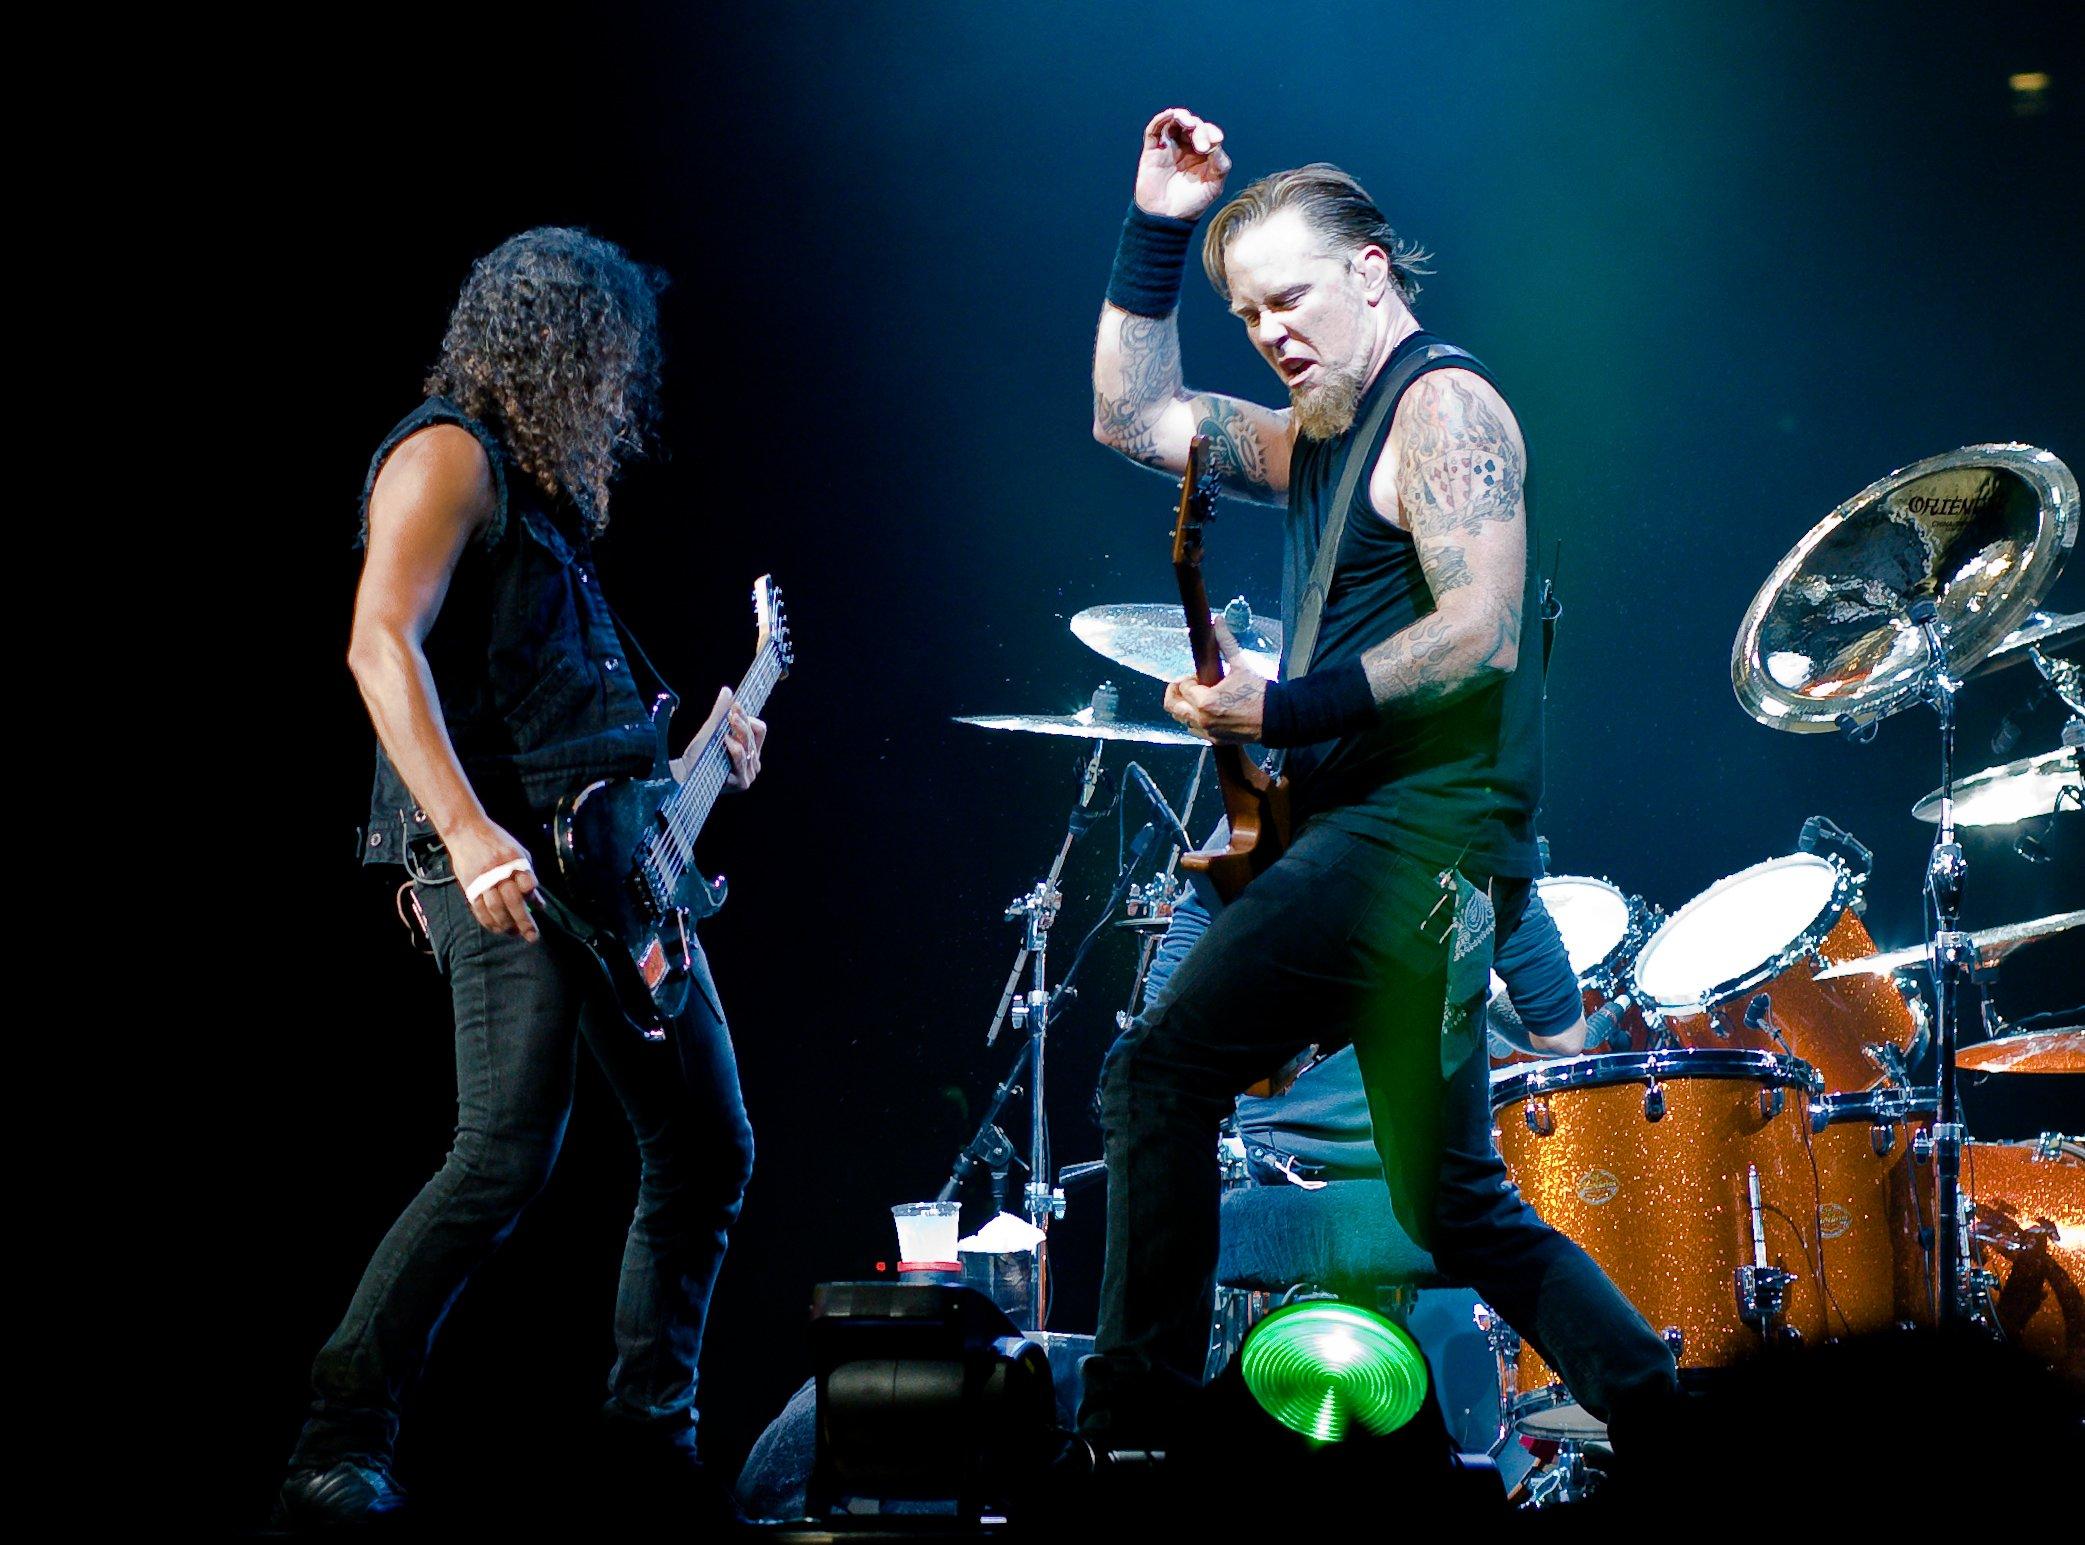 wikipedia.jpg?resize=1200,630 - Hommage : Metallica interprète « Ma gueule » de Johnny